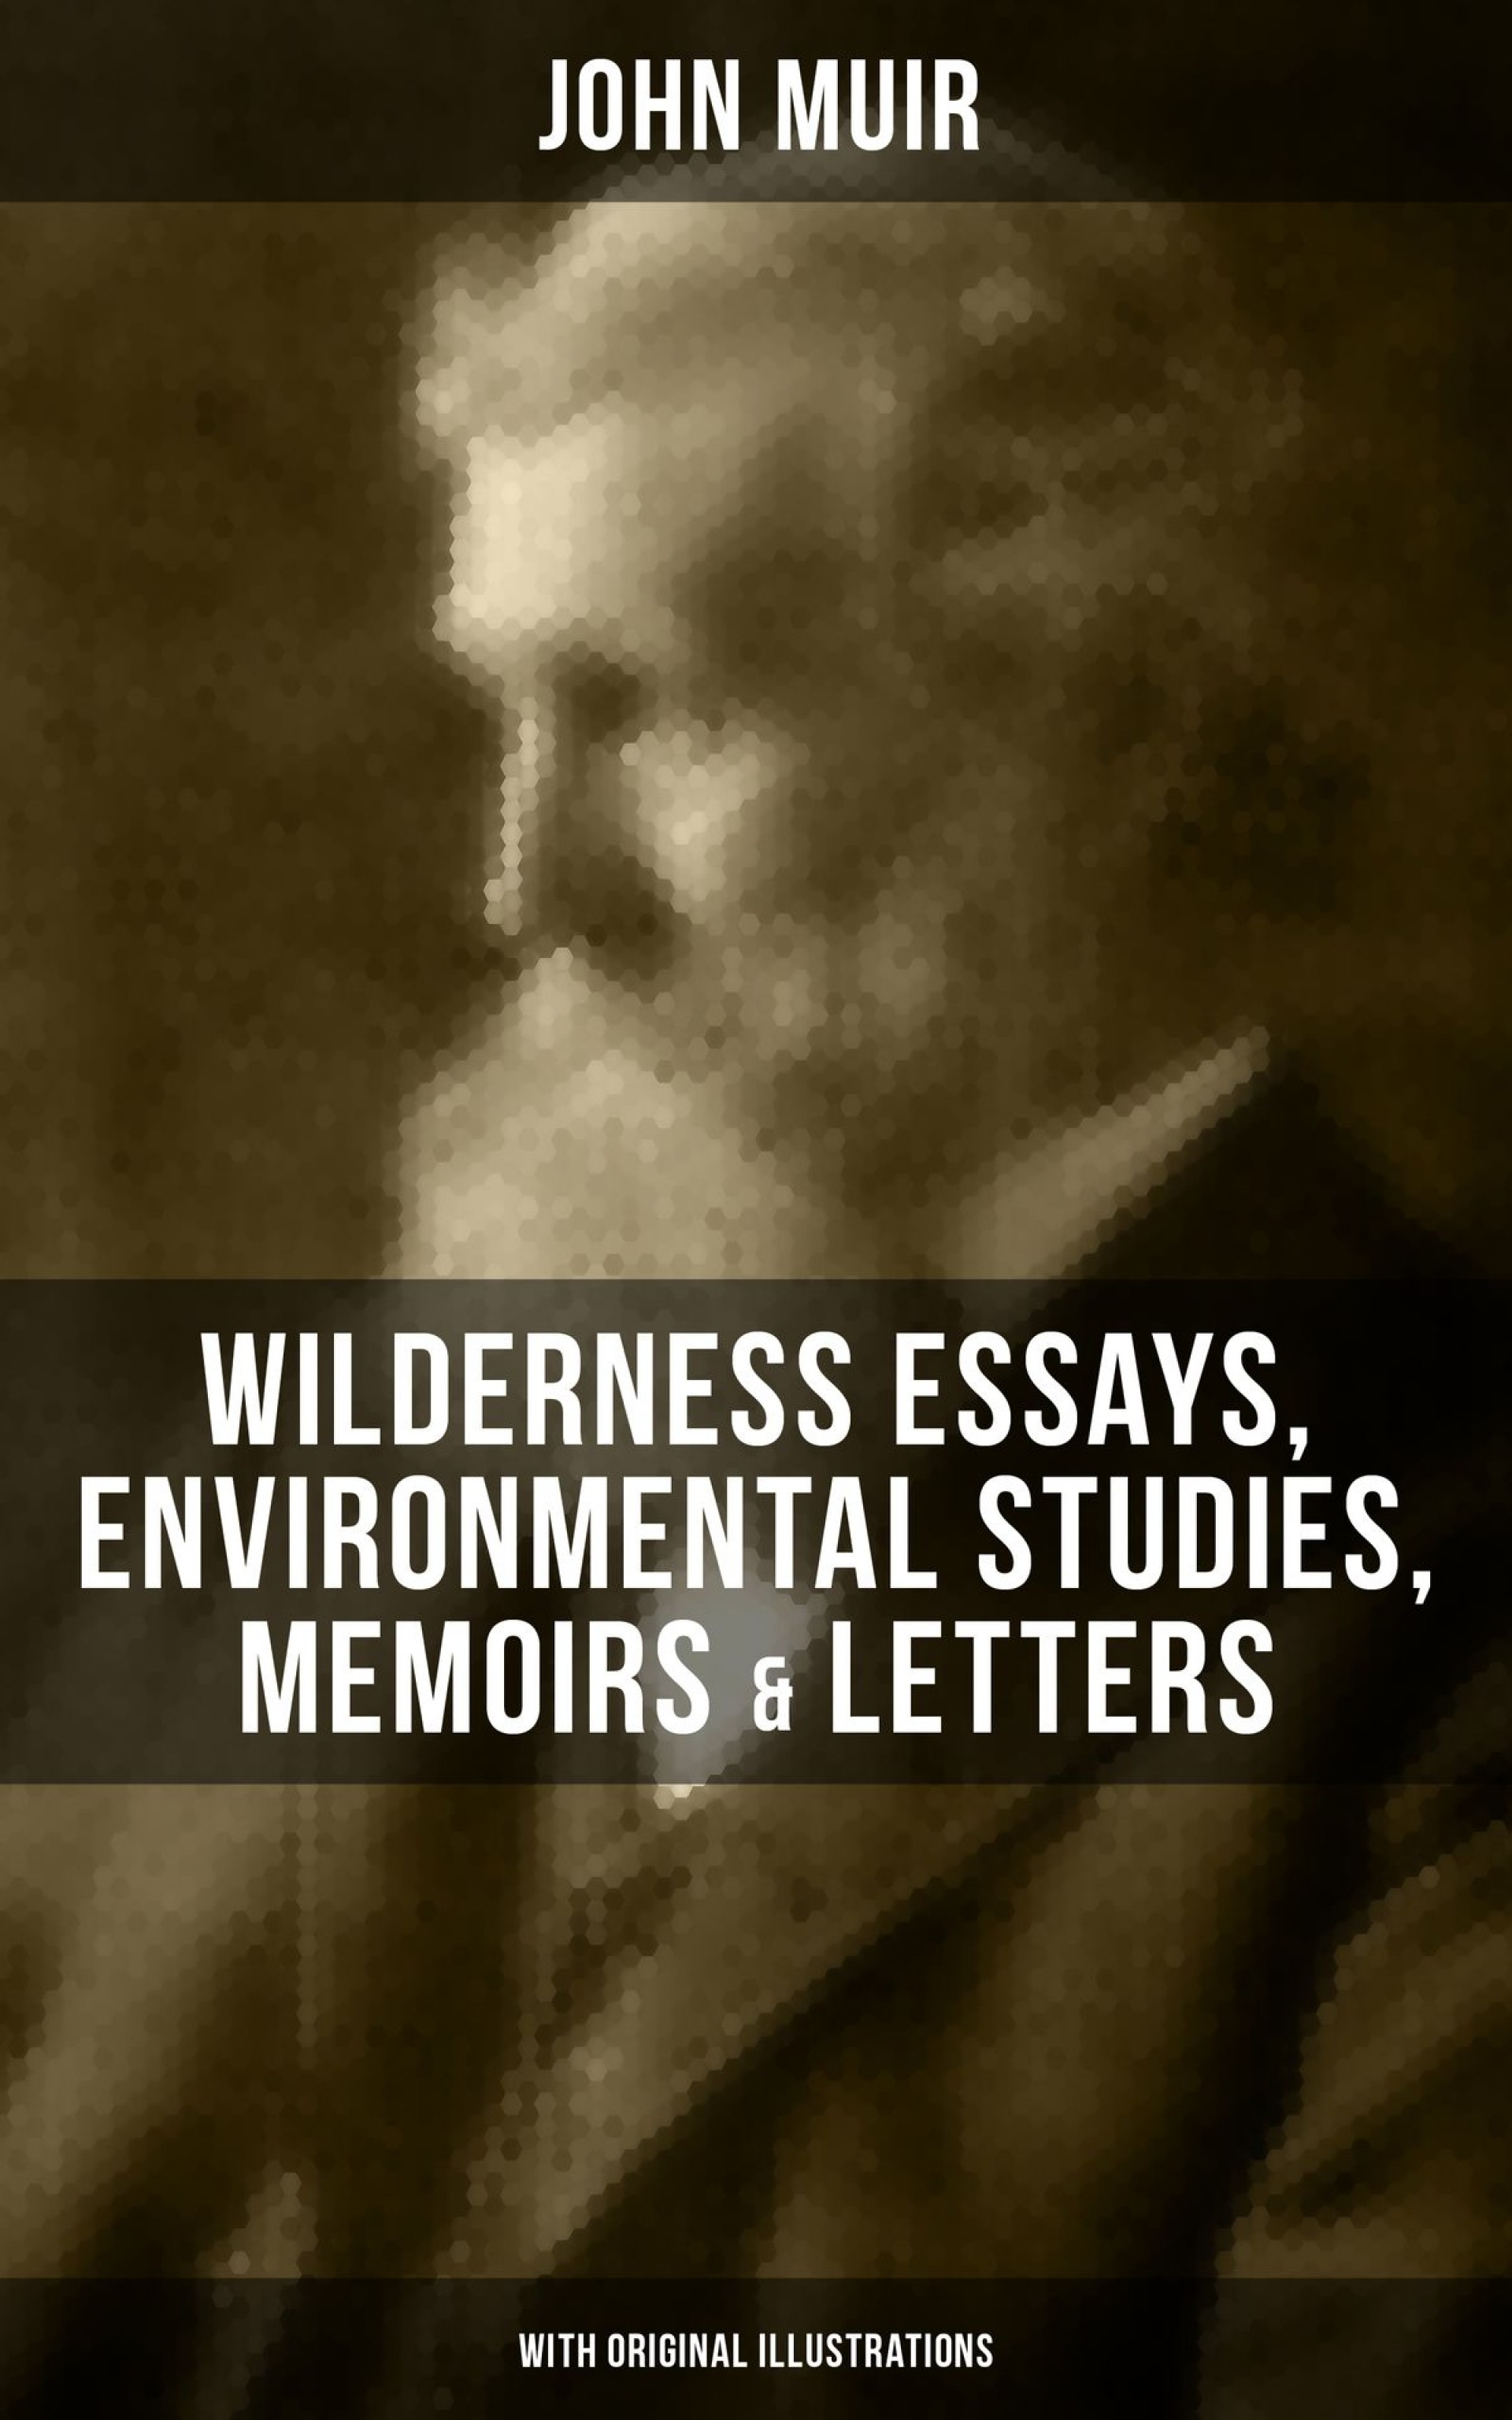 016 Essay Example John Muir Wilderness Essays Environmental Studies Memoirs Letters With Original Best Pdf Review 1920